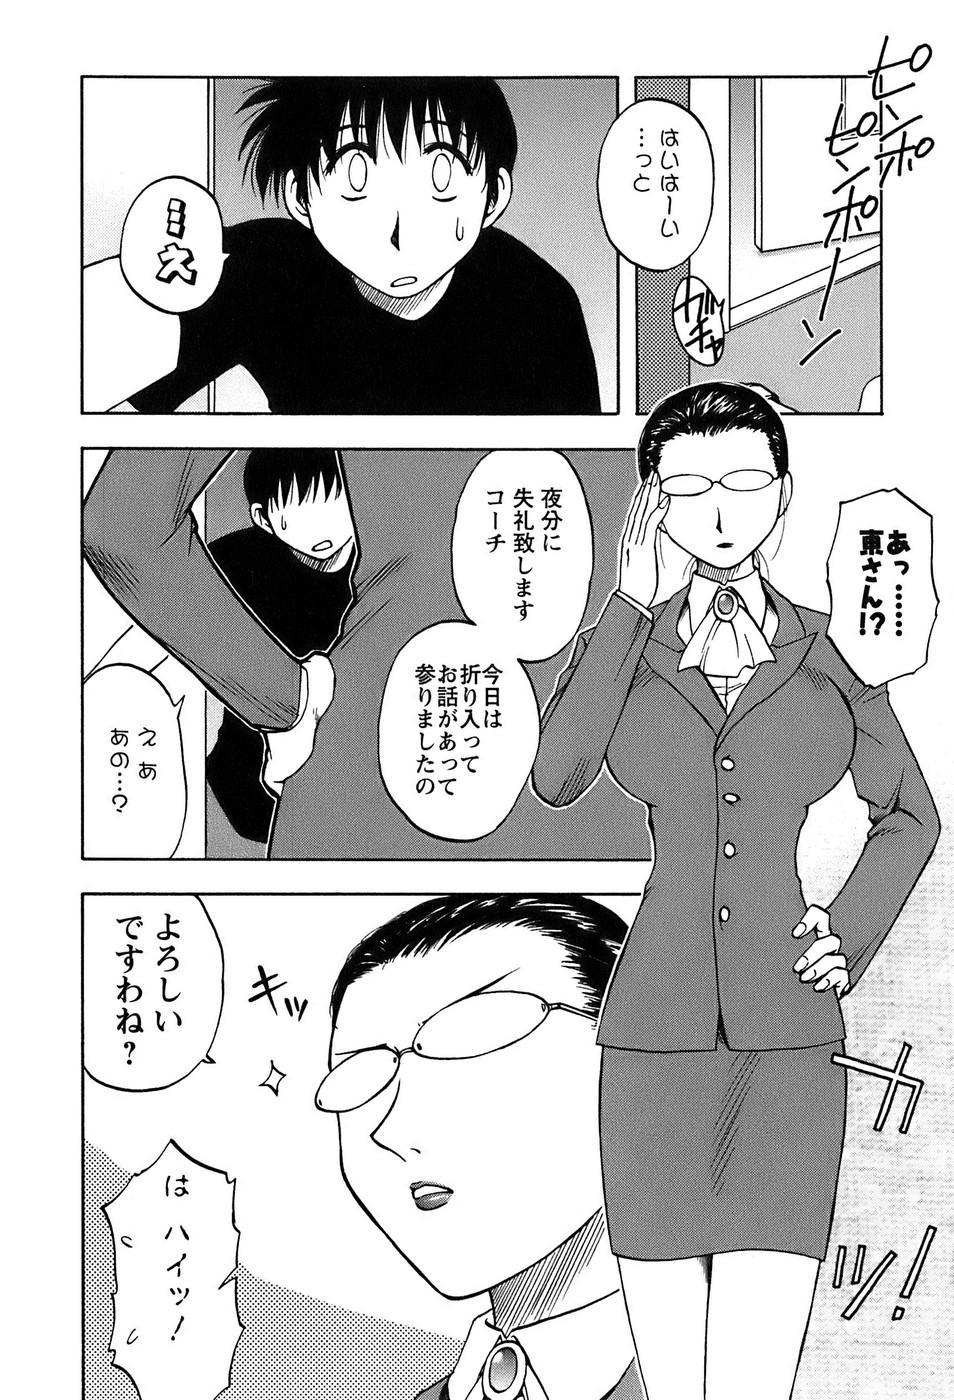 Okusan Volley - Madam Volleyball 106